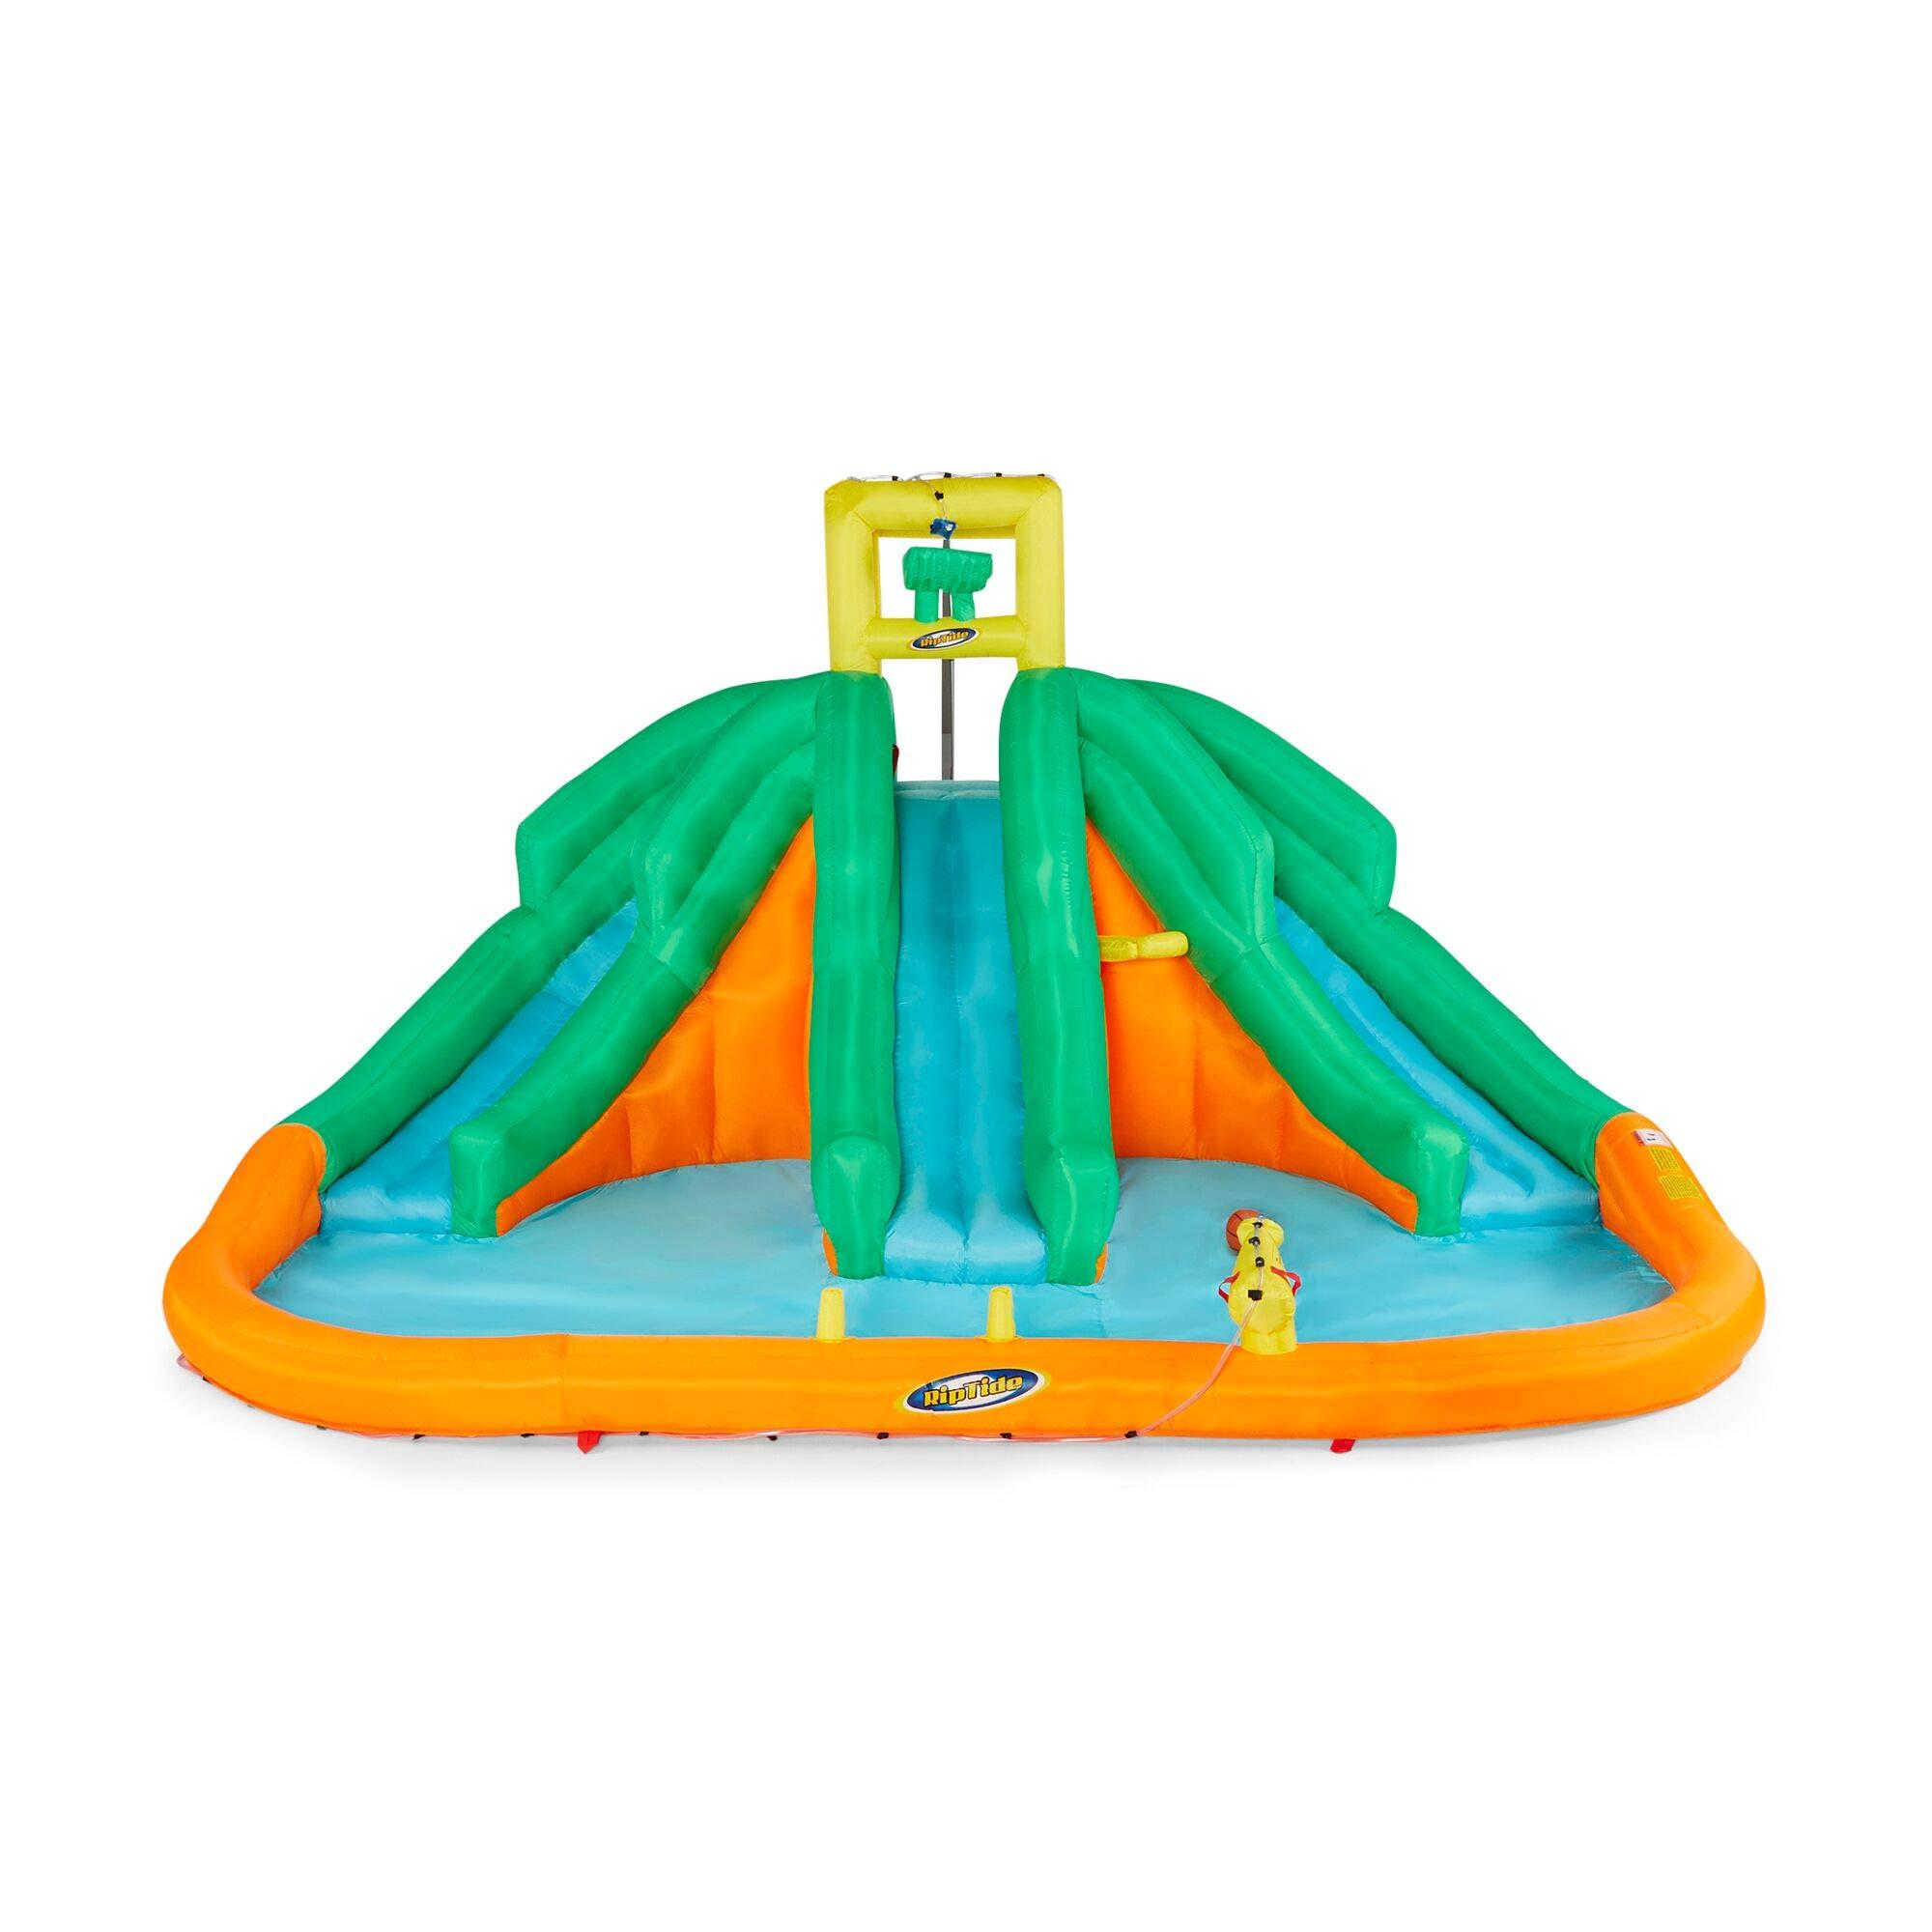 Kahuna Triple Monster Inflatable Backyard Kiddie Water Park & Slide by Kahuna